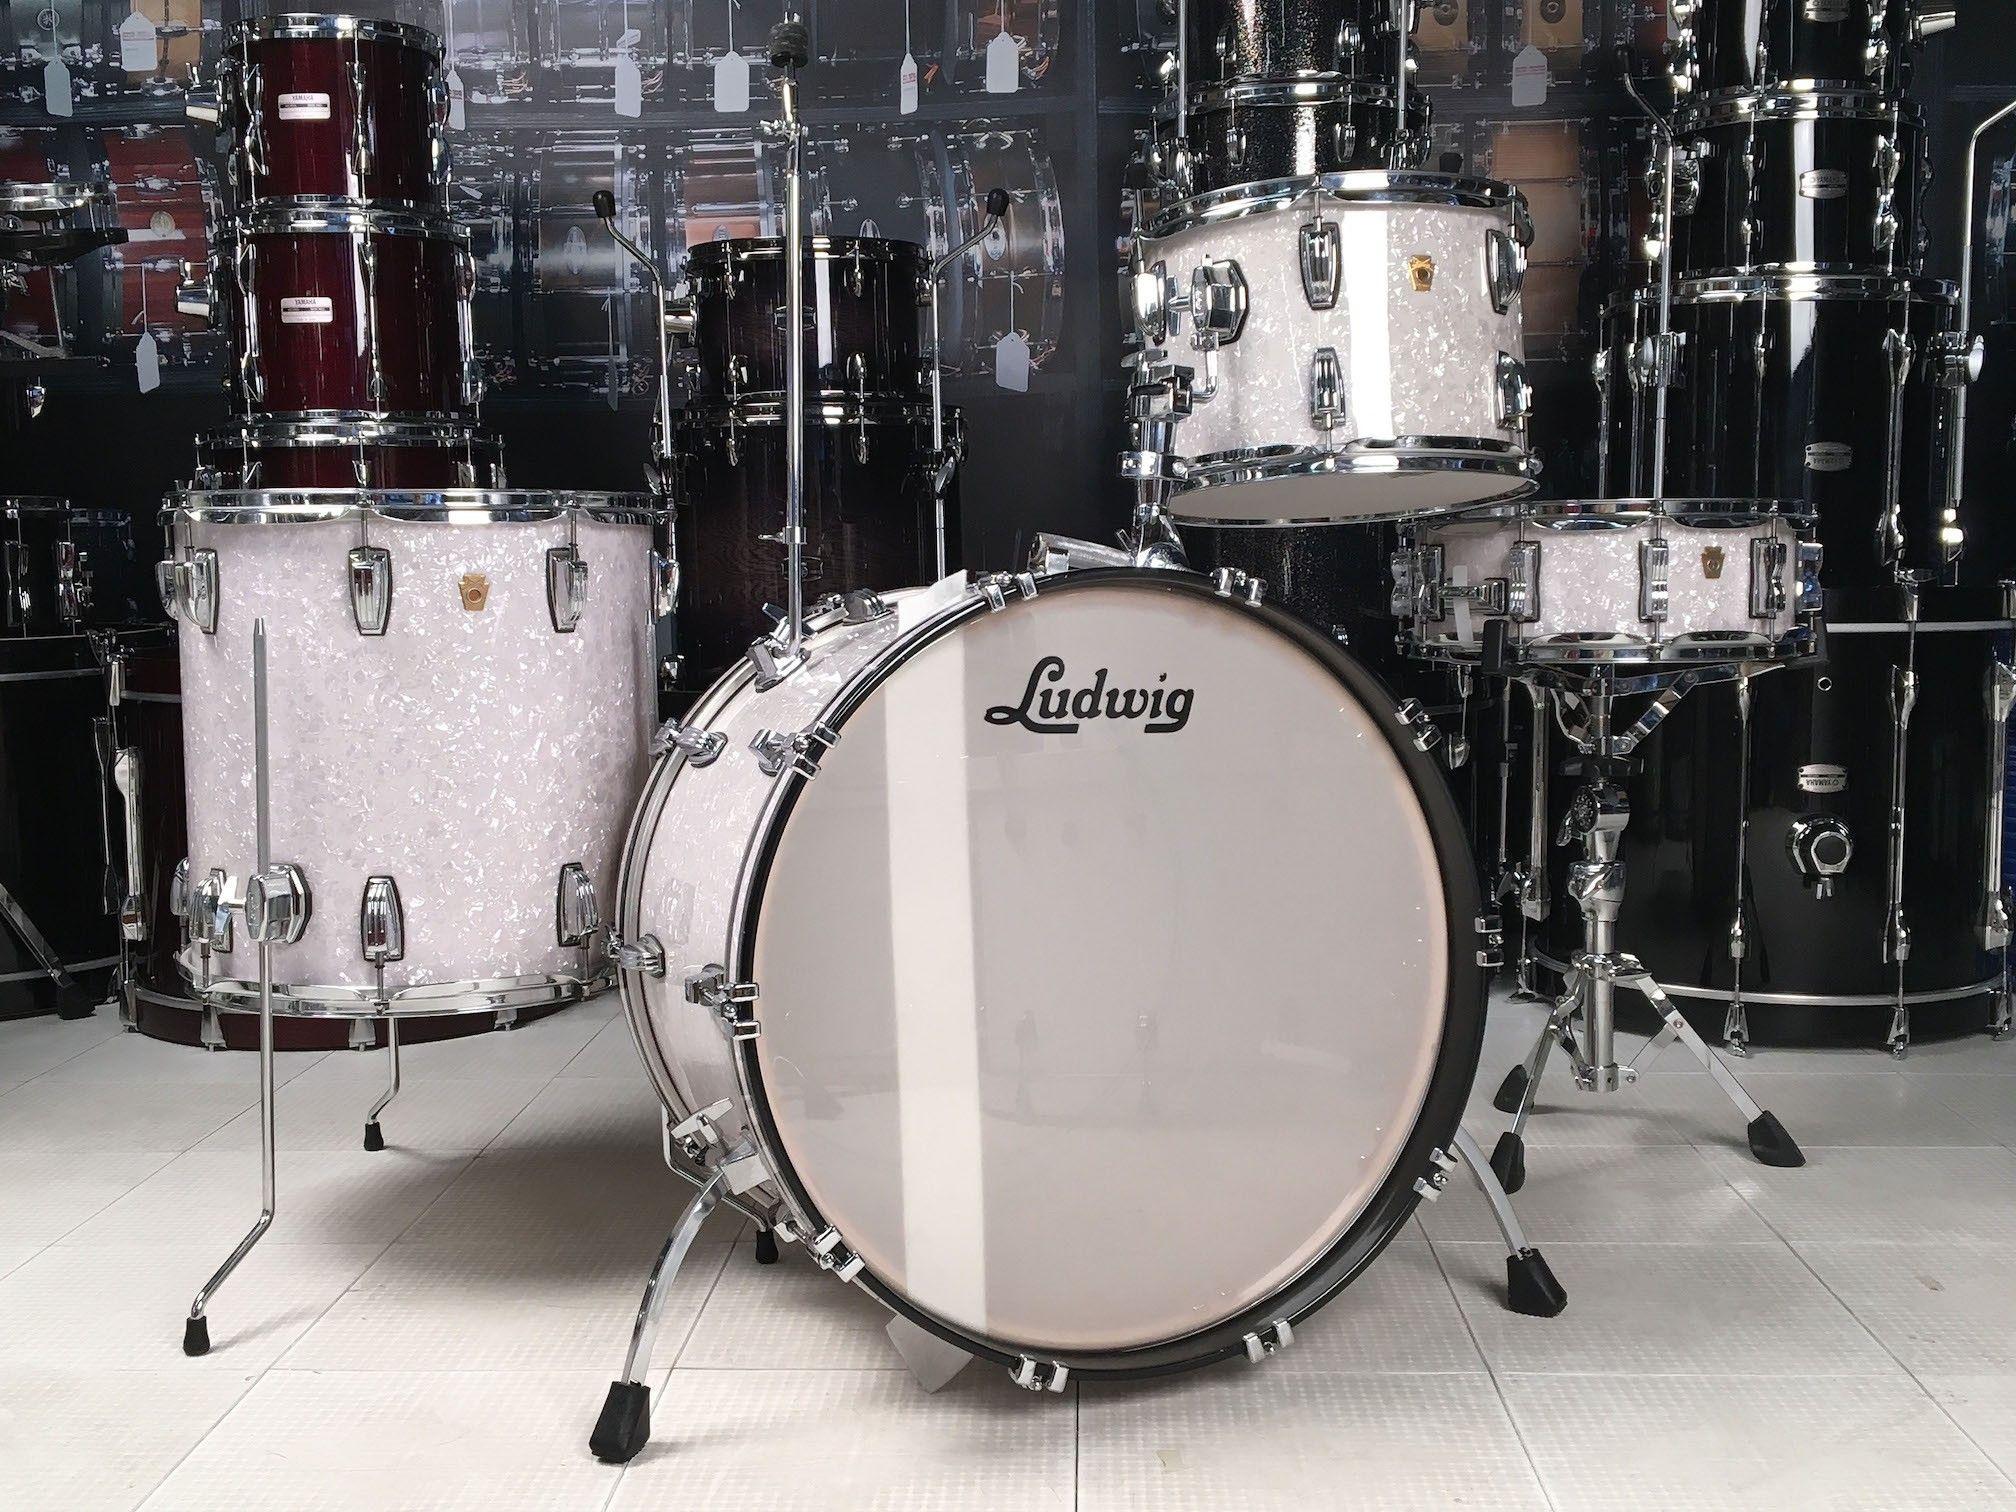 used ludwig legacy 4pc drum set white marine pearl drum kits in 2019 pinterest drums. Black Bedroom Furniture Sets. Home Design Ideas